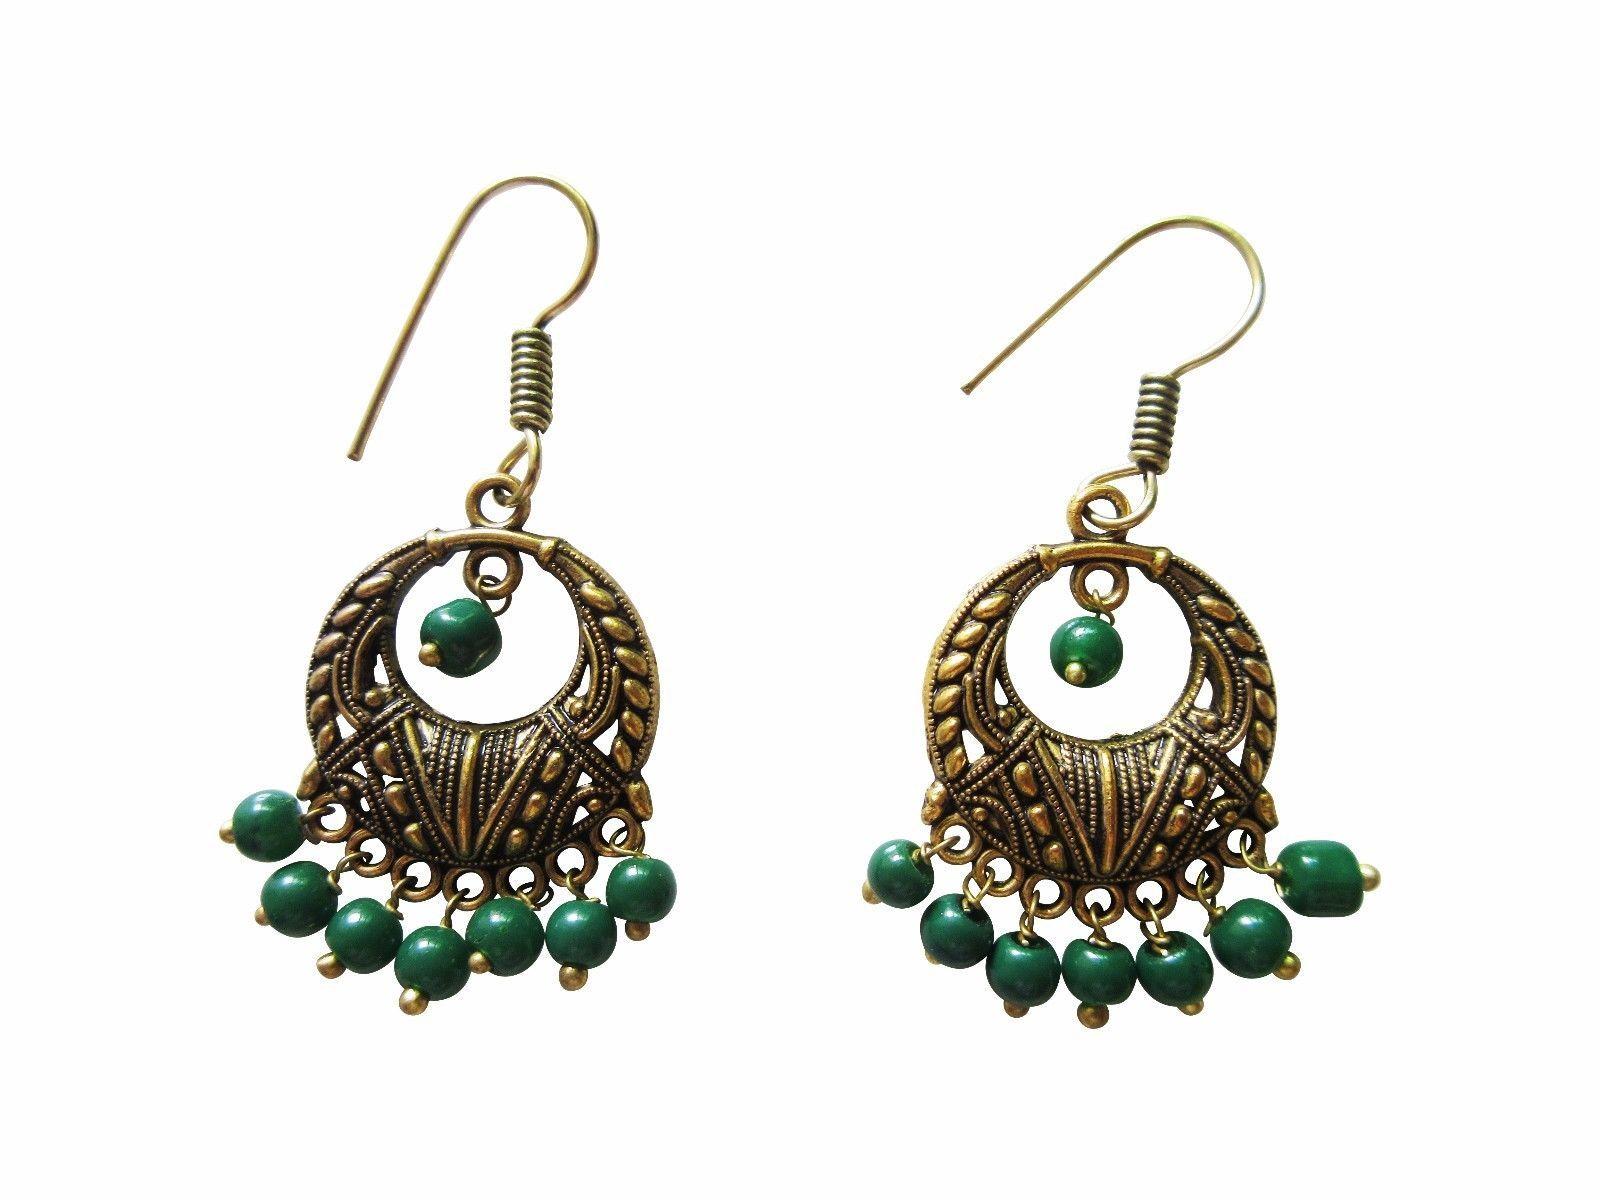 Ethnic Earrings Bollywood Fashion Jewelry Oxidized Pearl Indian Women's Fashion